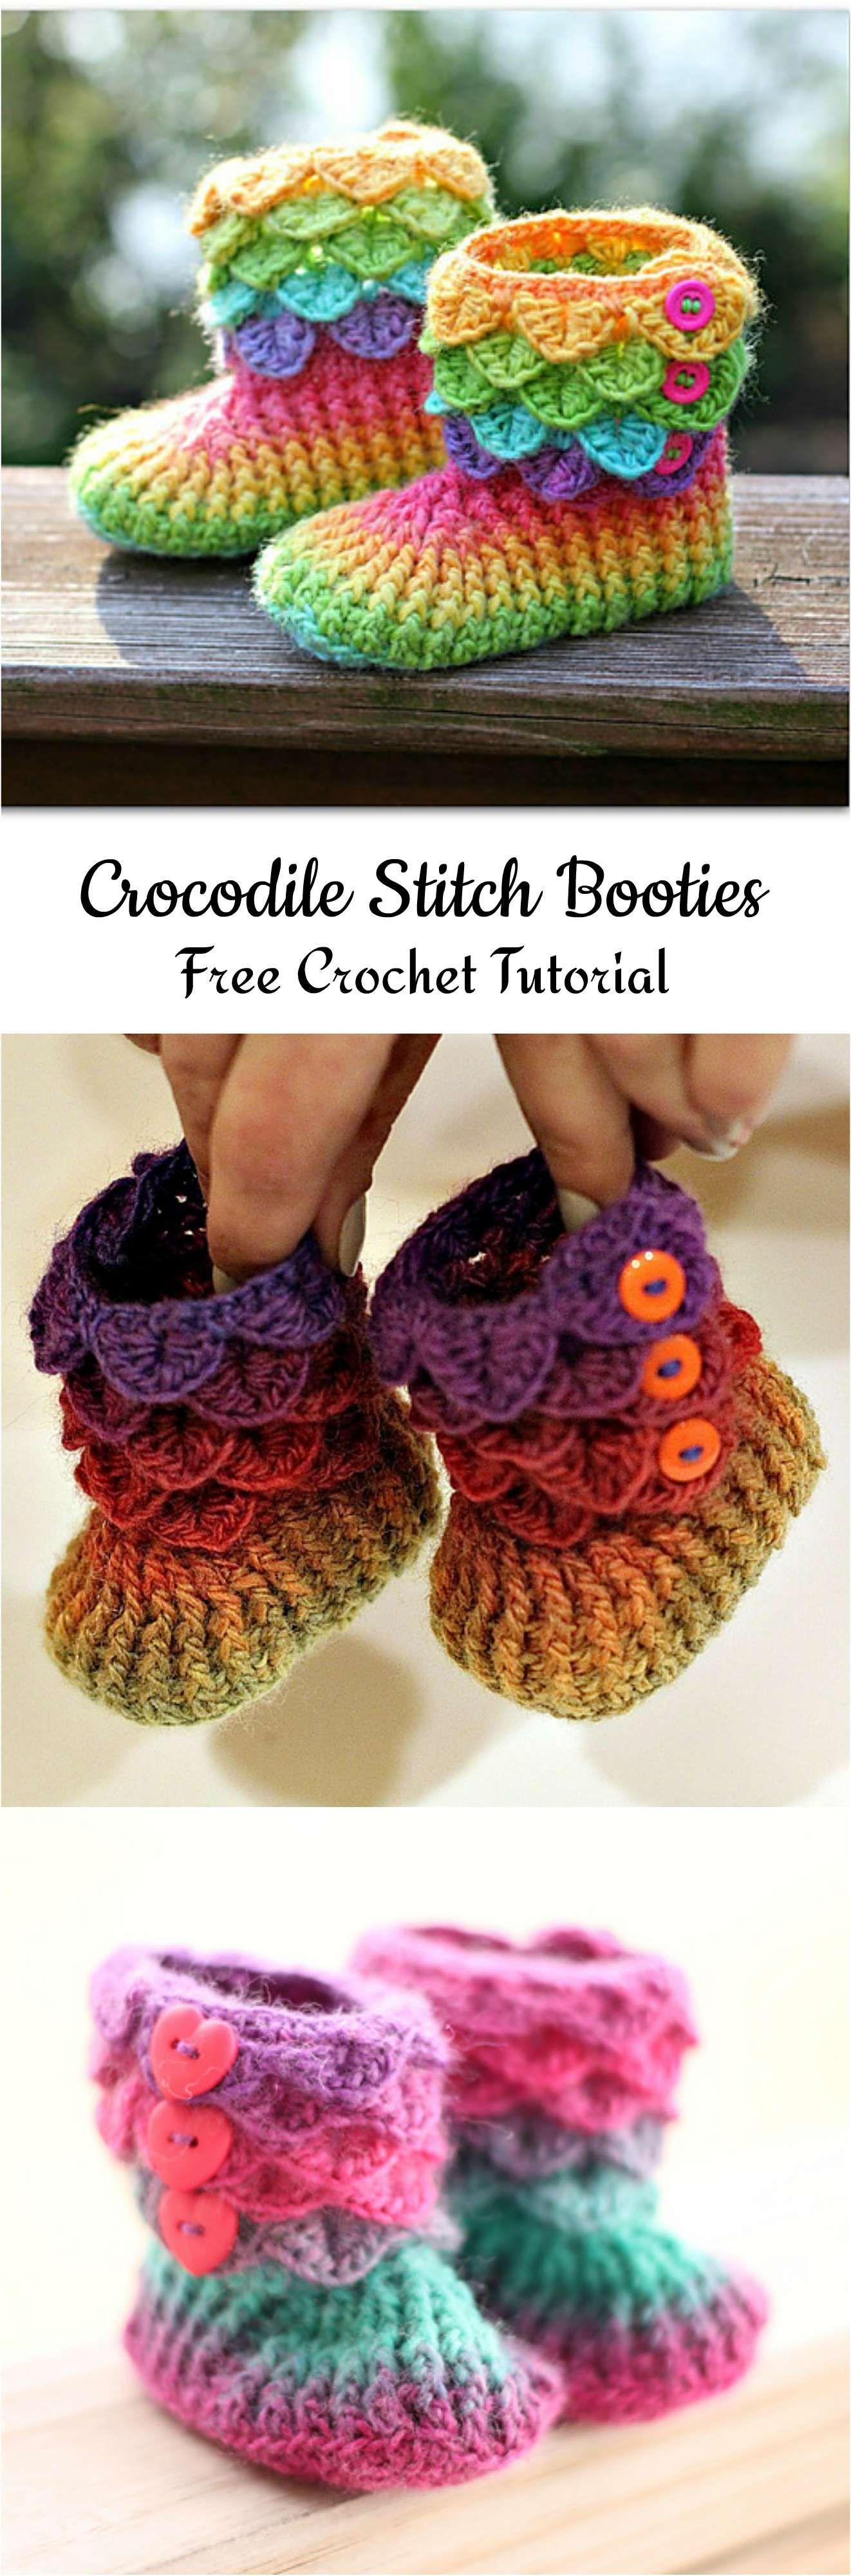 Crochet Crocodile Stitch Booties | Crochet & Knitting | Pinterest ...